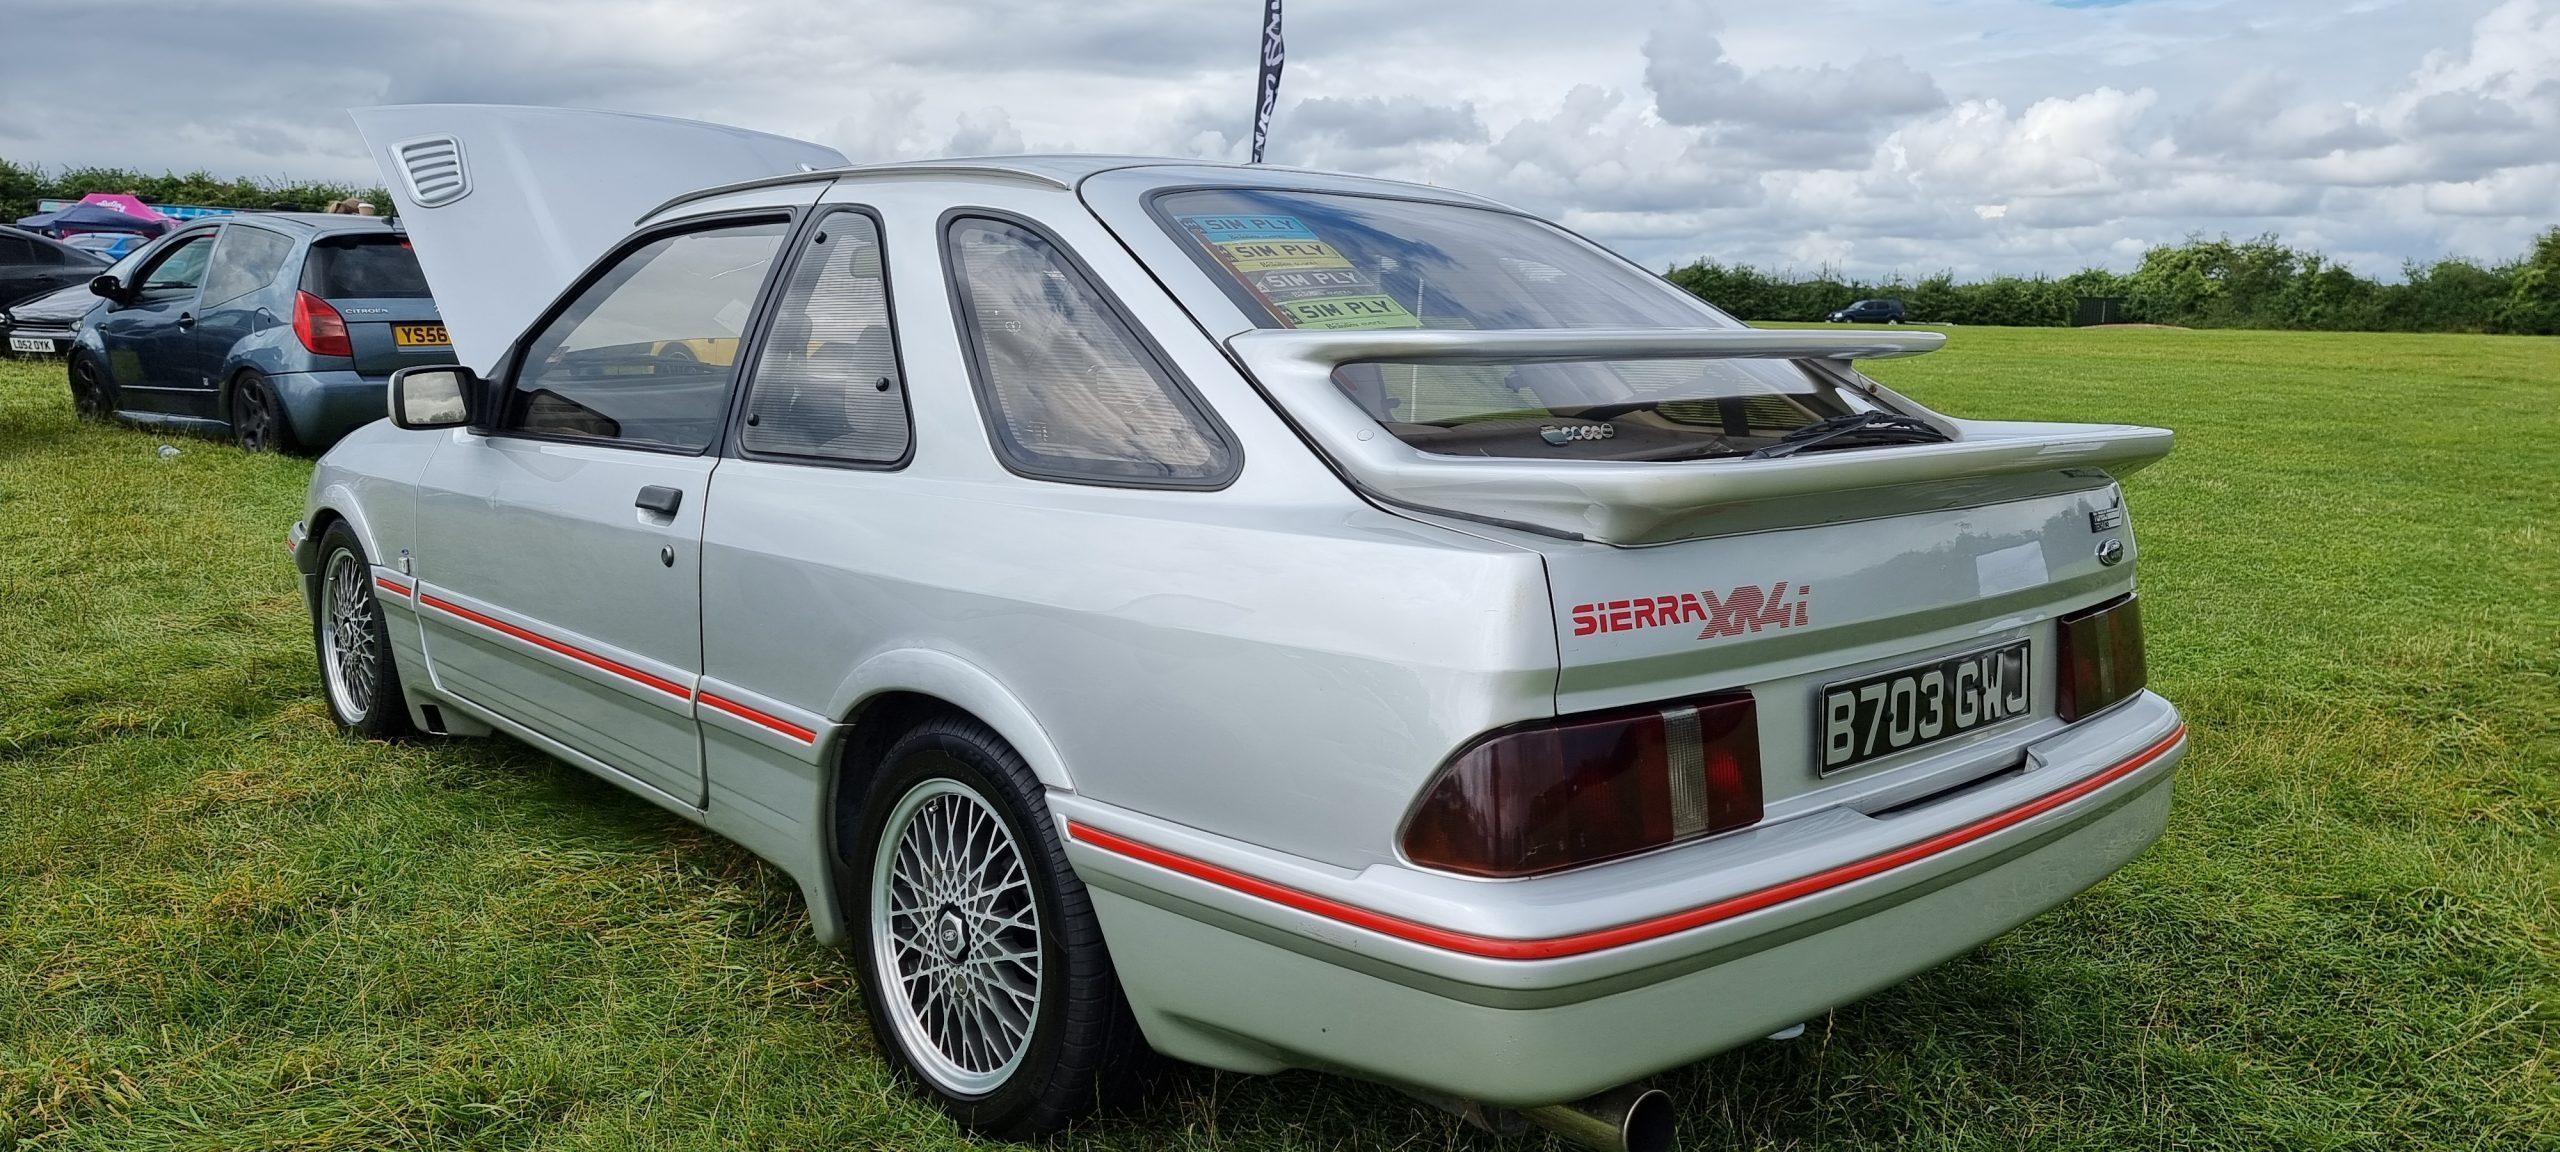 Ford-Sierra-XR4i